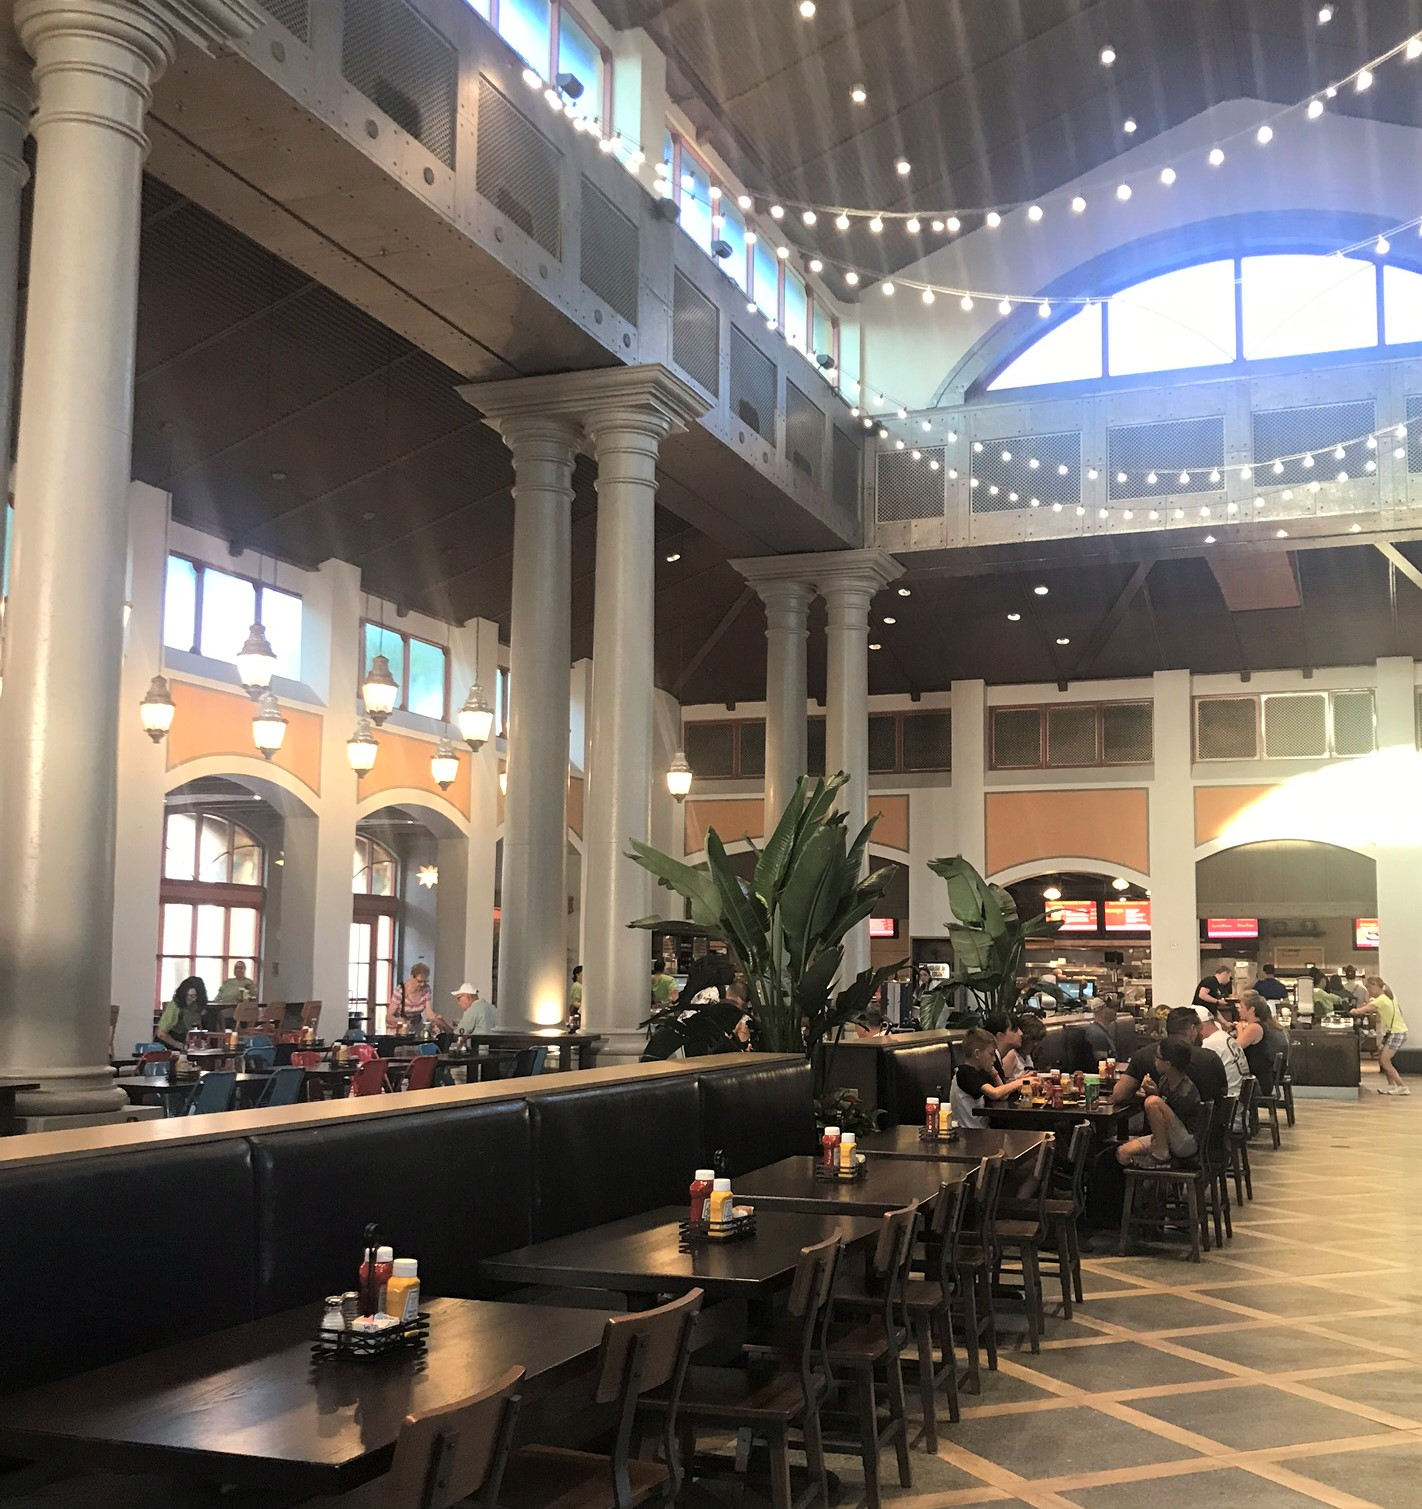 interior dining area at Coronado Springs